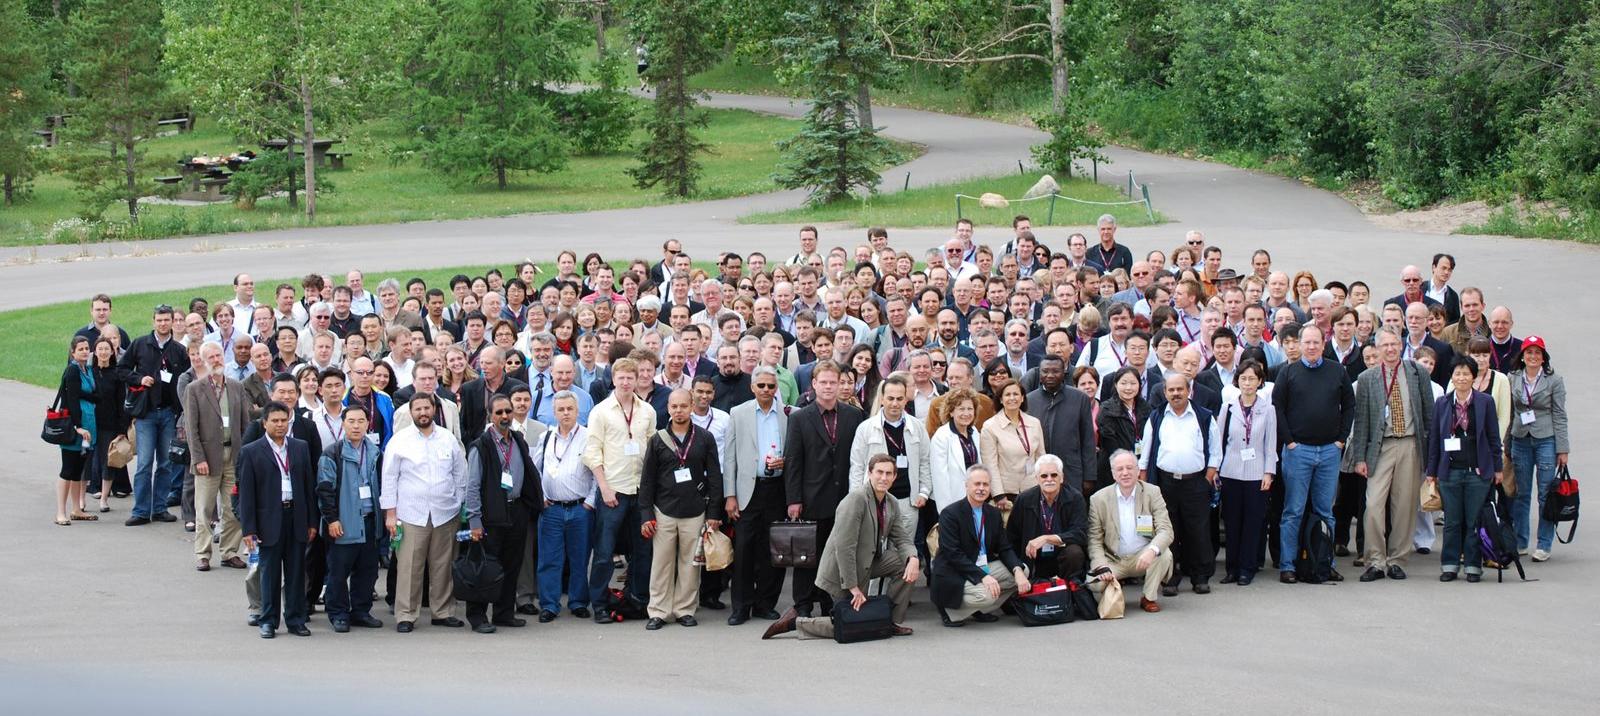 Edmonton 2009